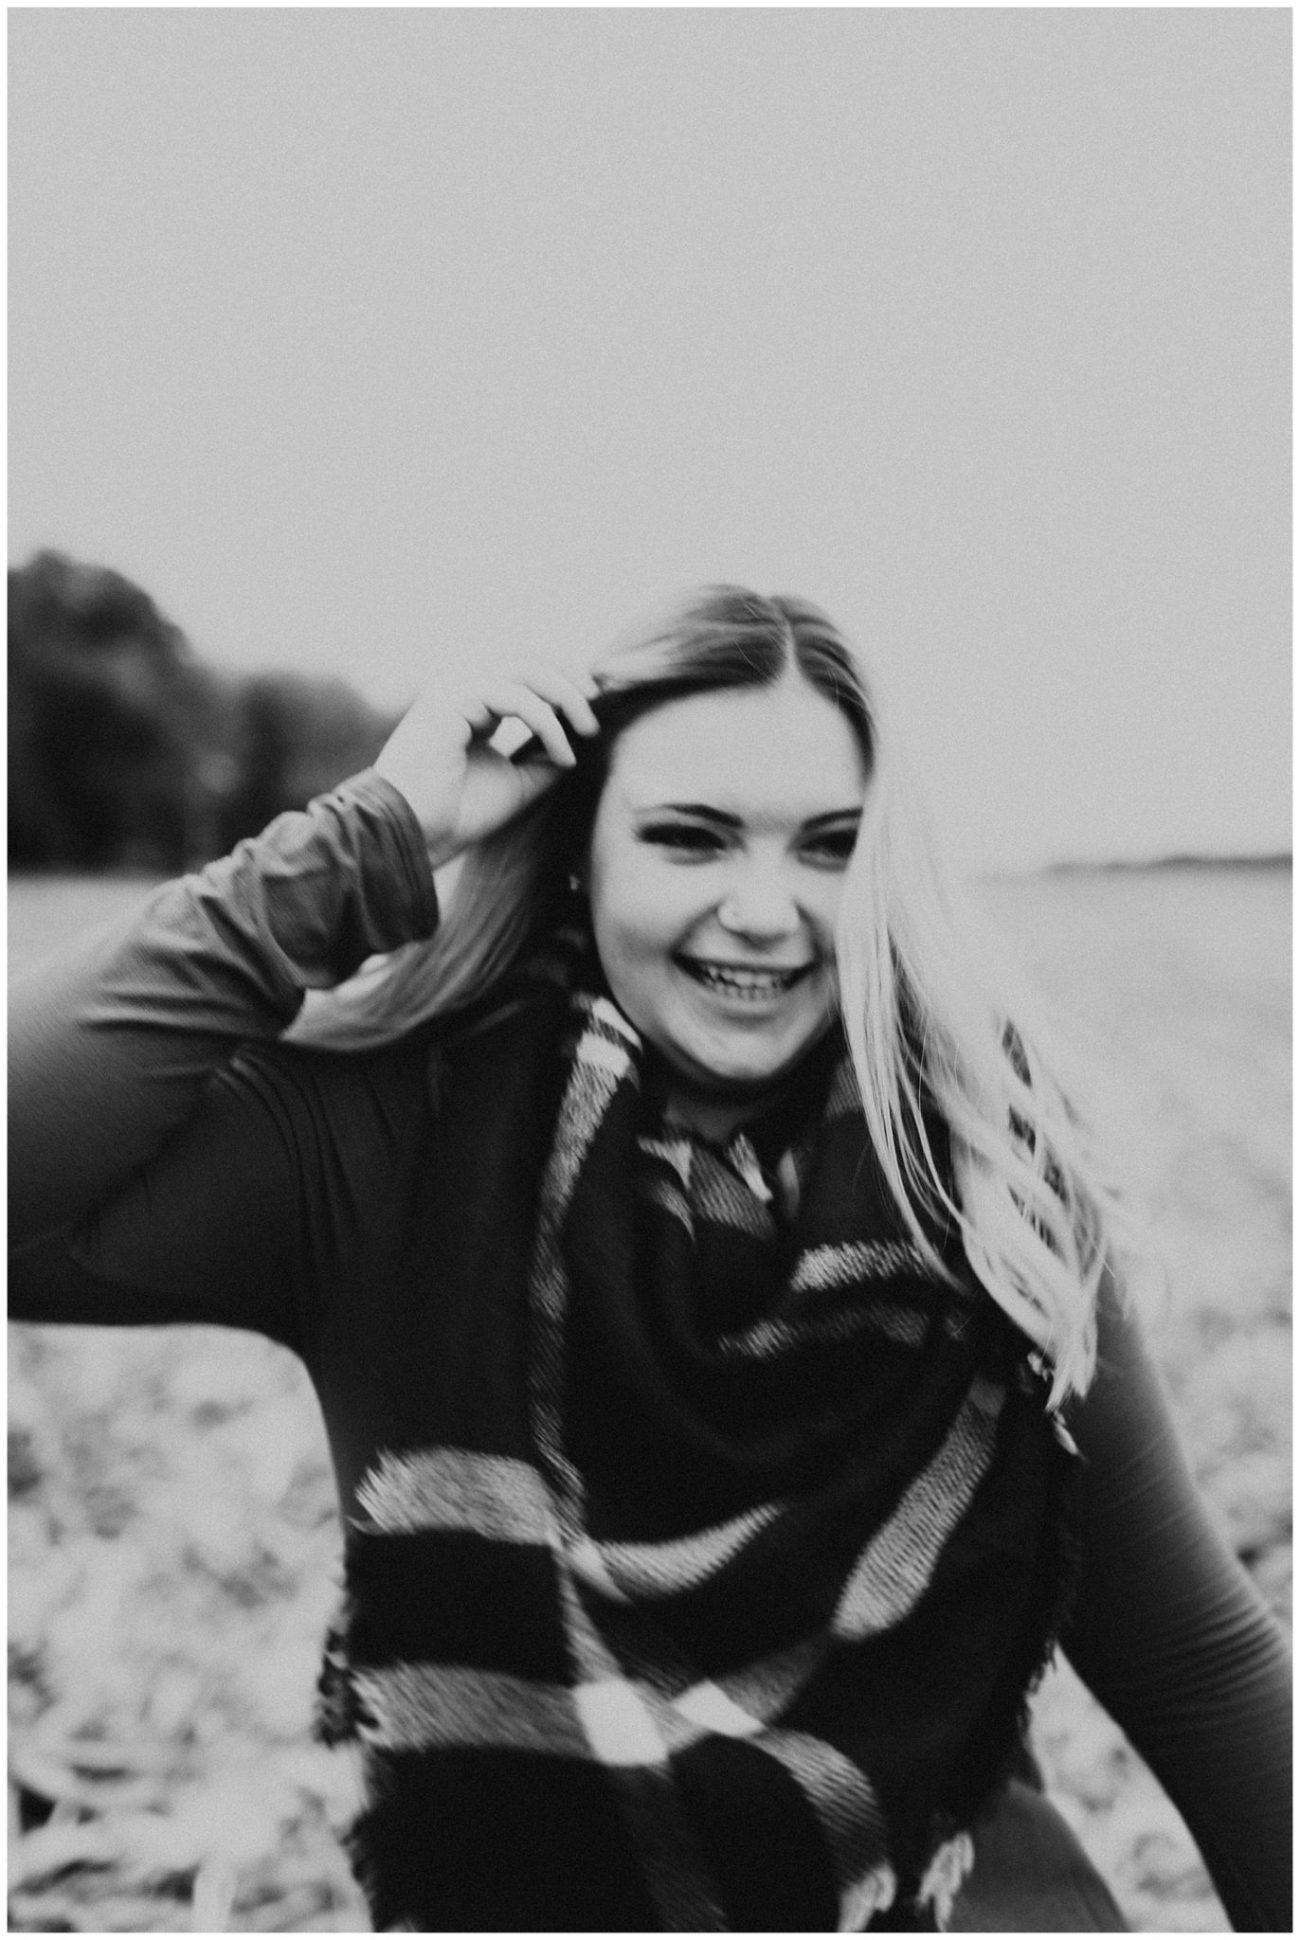 Paige - Lauren F otography | Central Illinois Wedding